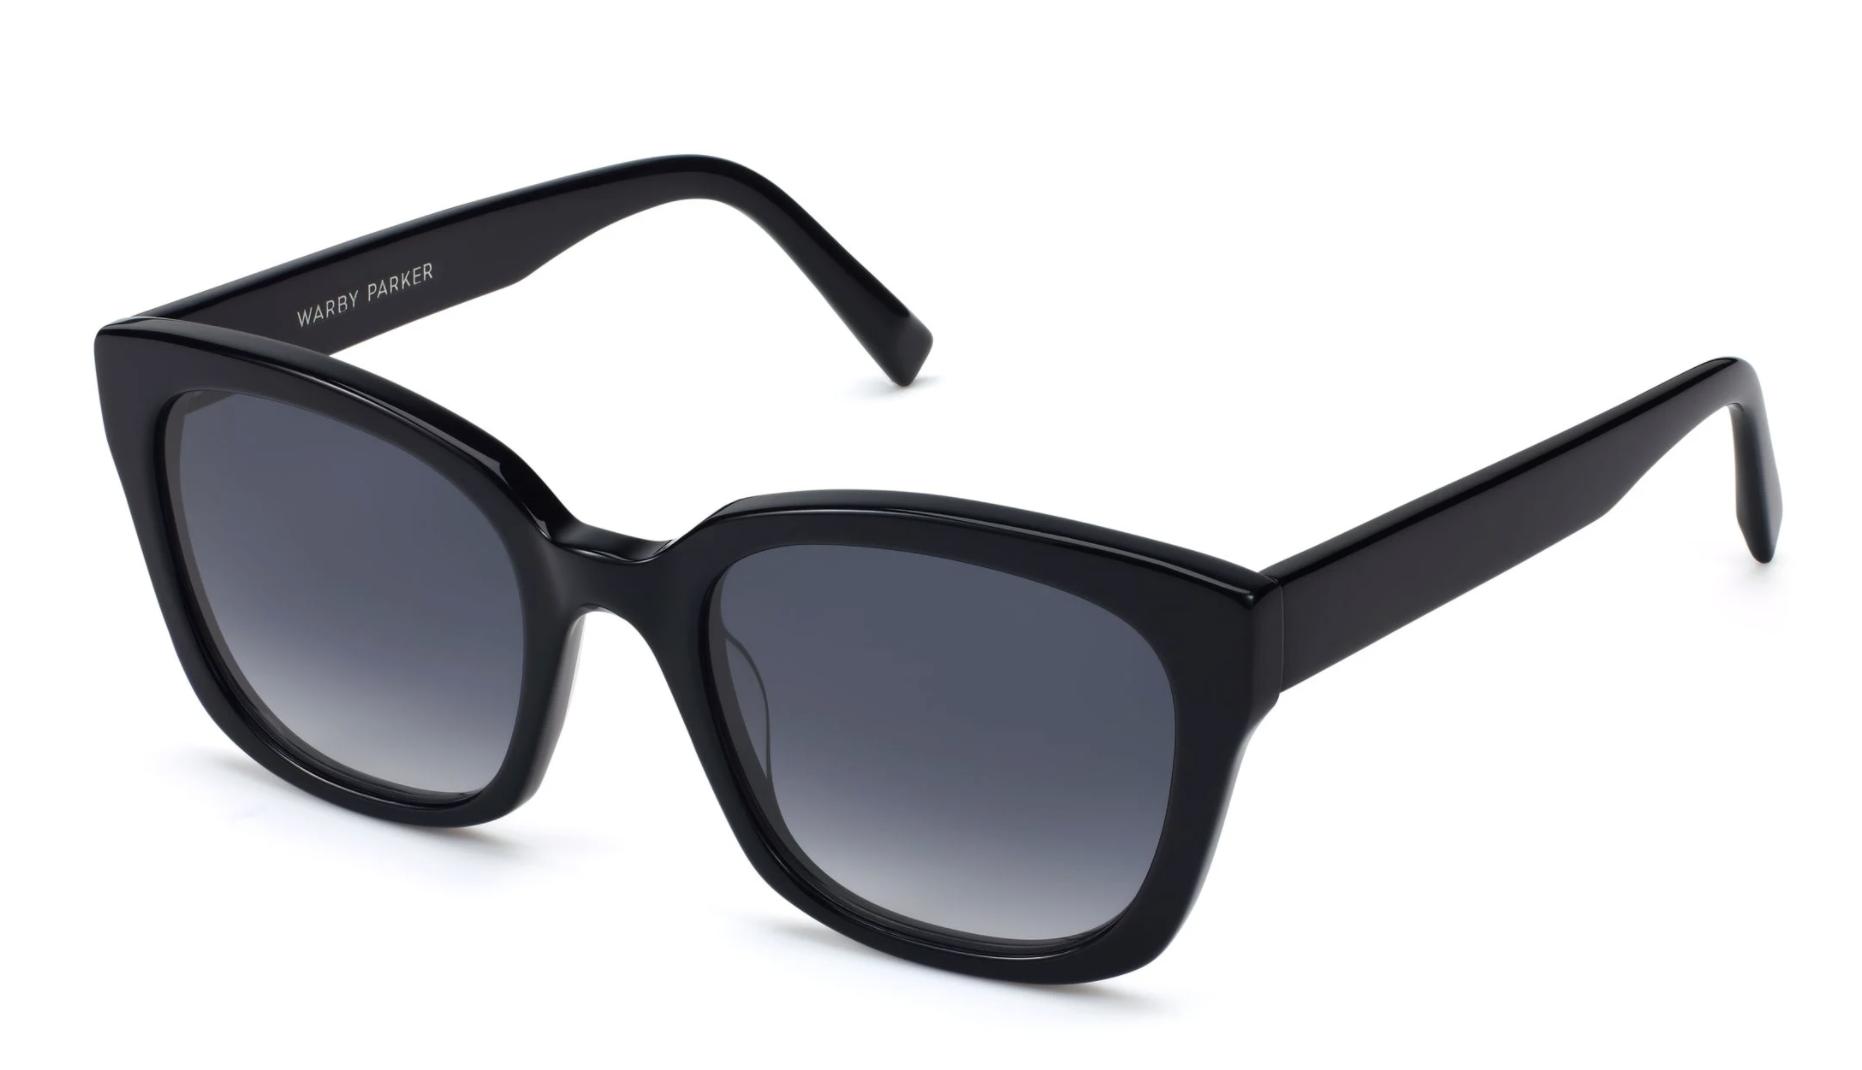 the black sunglasses